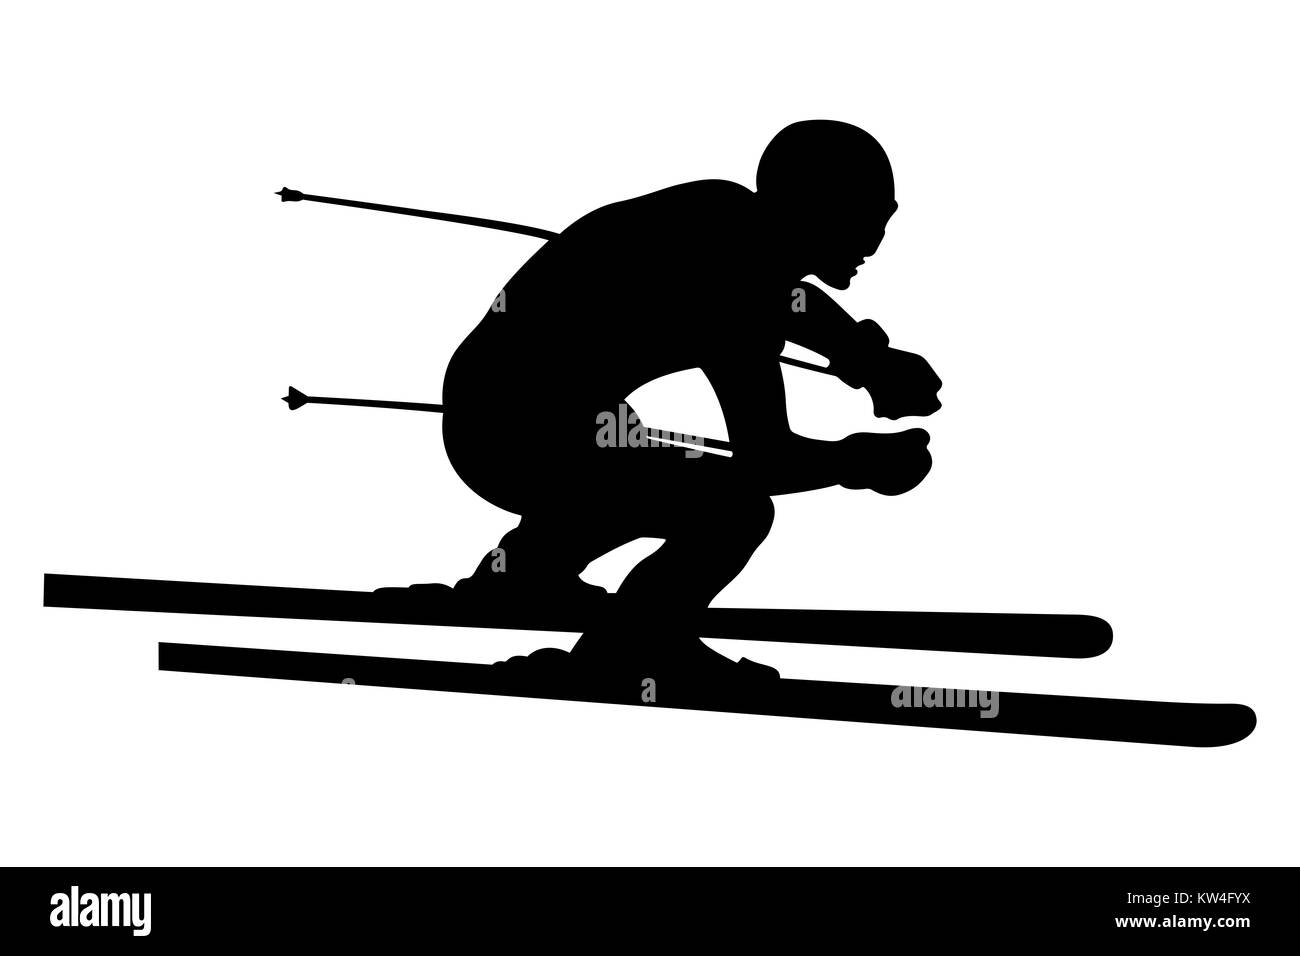 skier athlete downhill alpine skiing vector illustration - Stock Image